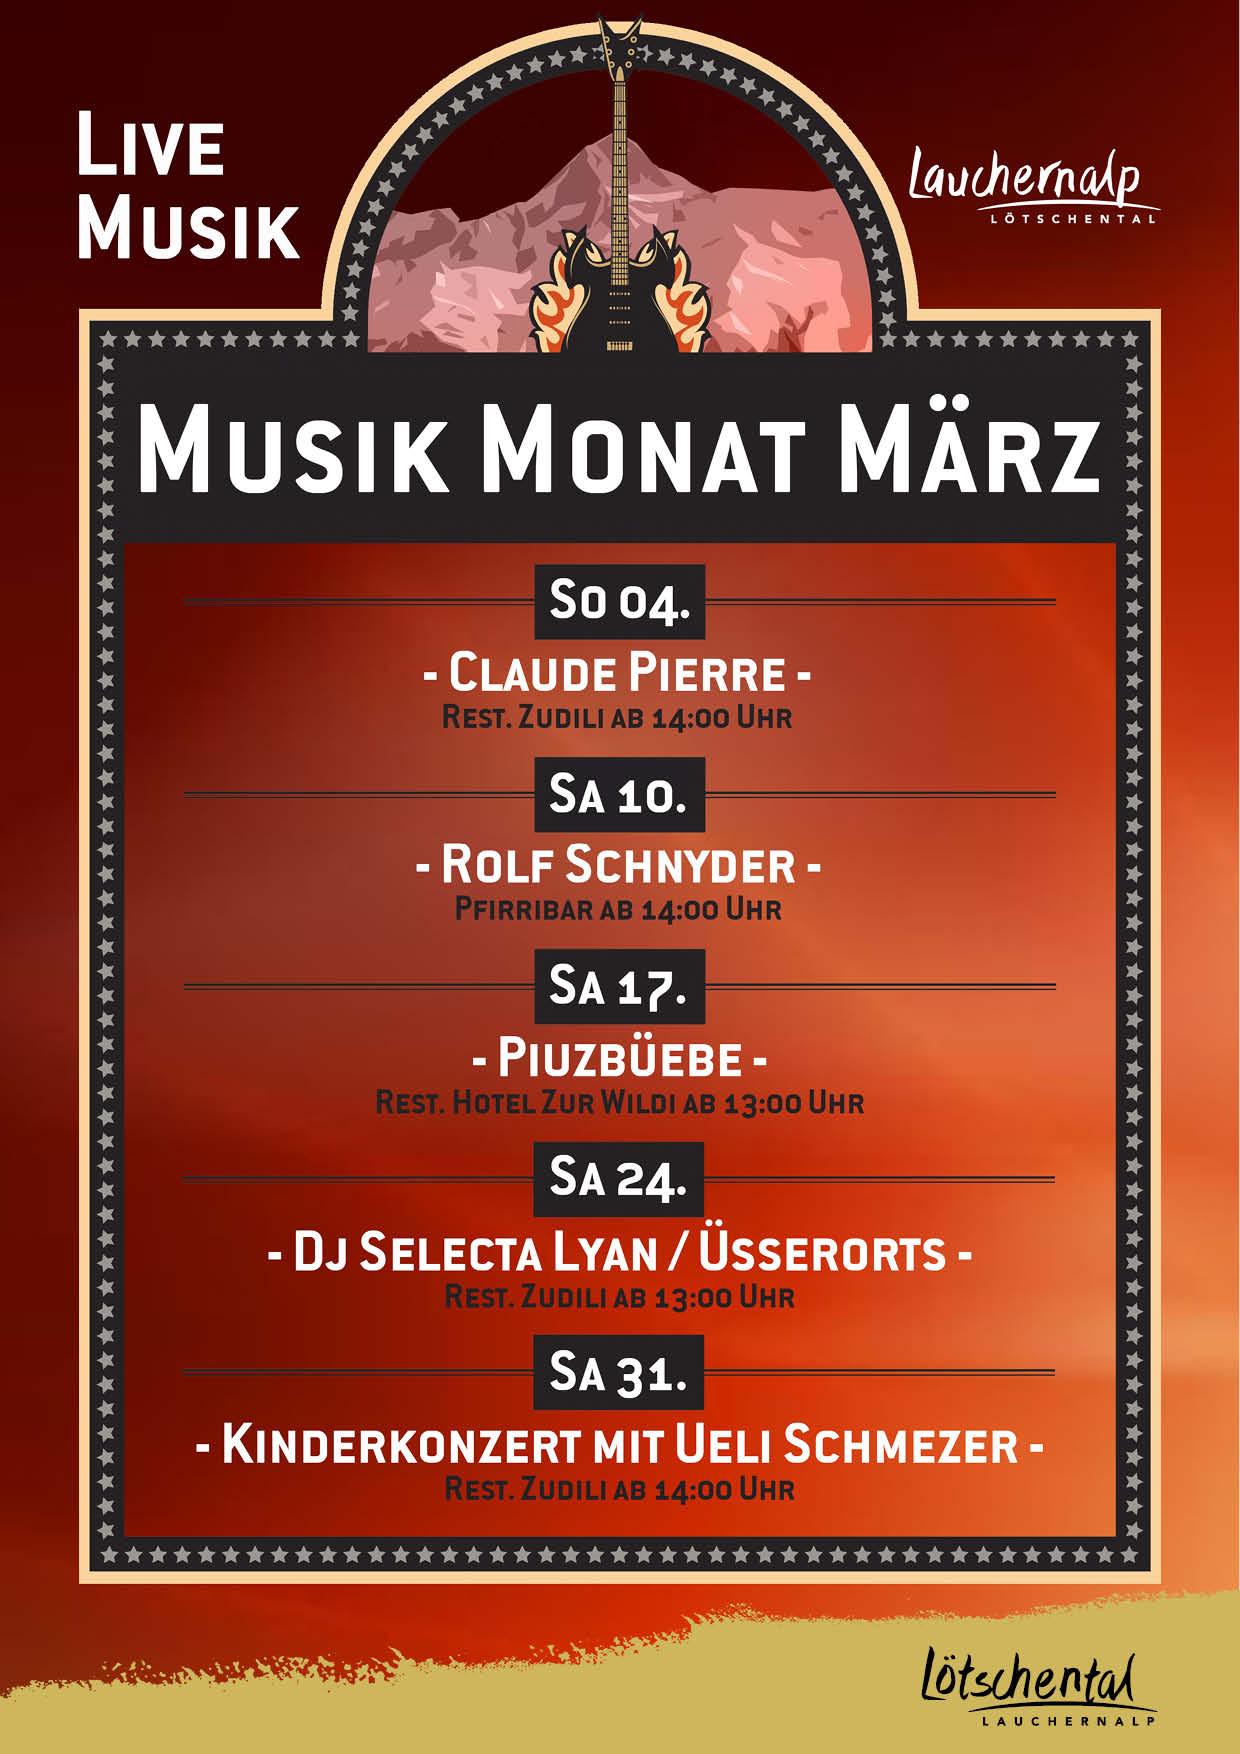 Musik Monat März Live mit Dj Selecta Lyan & Üsserorts